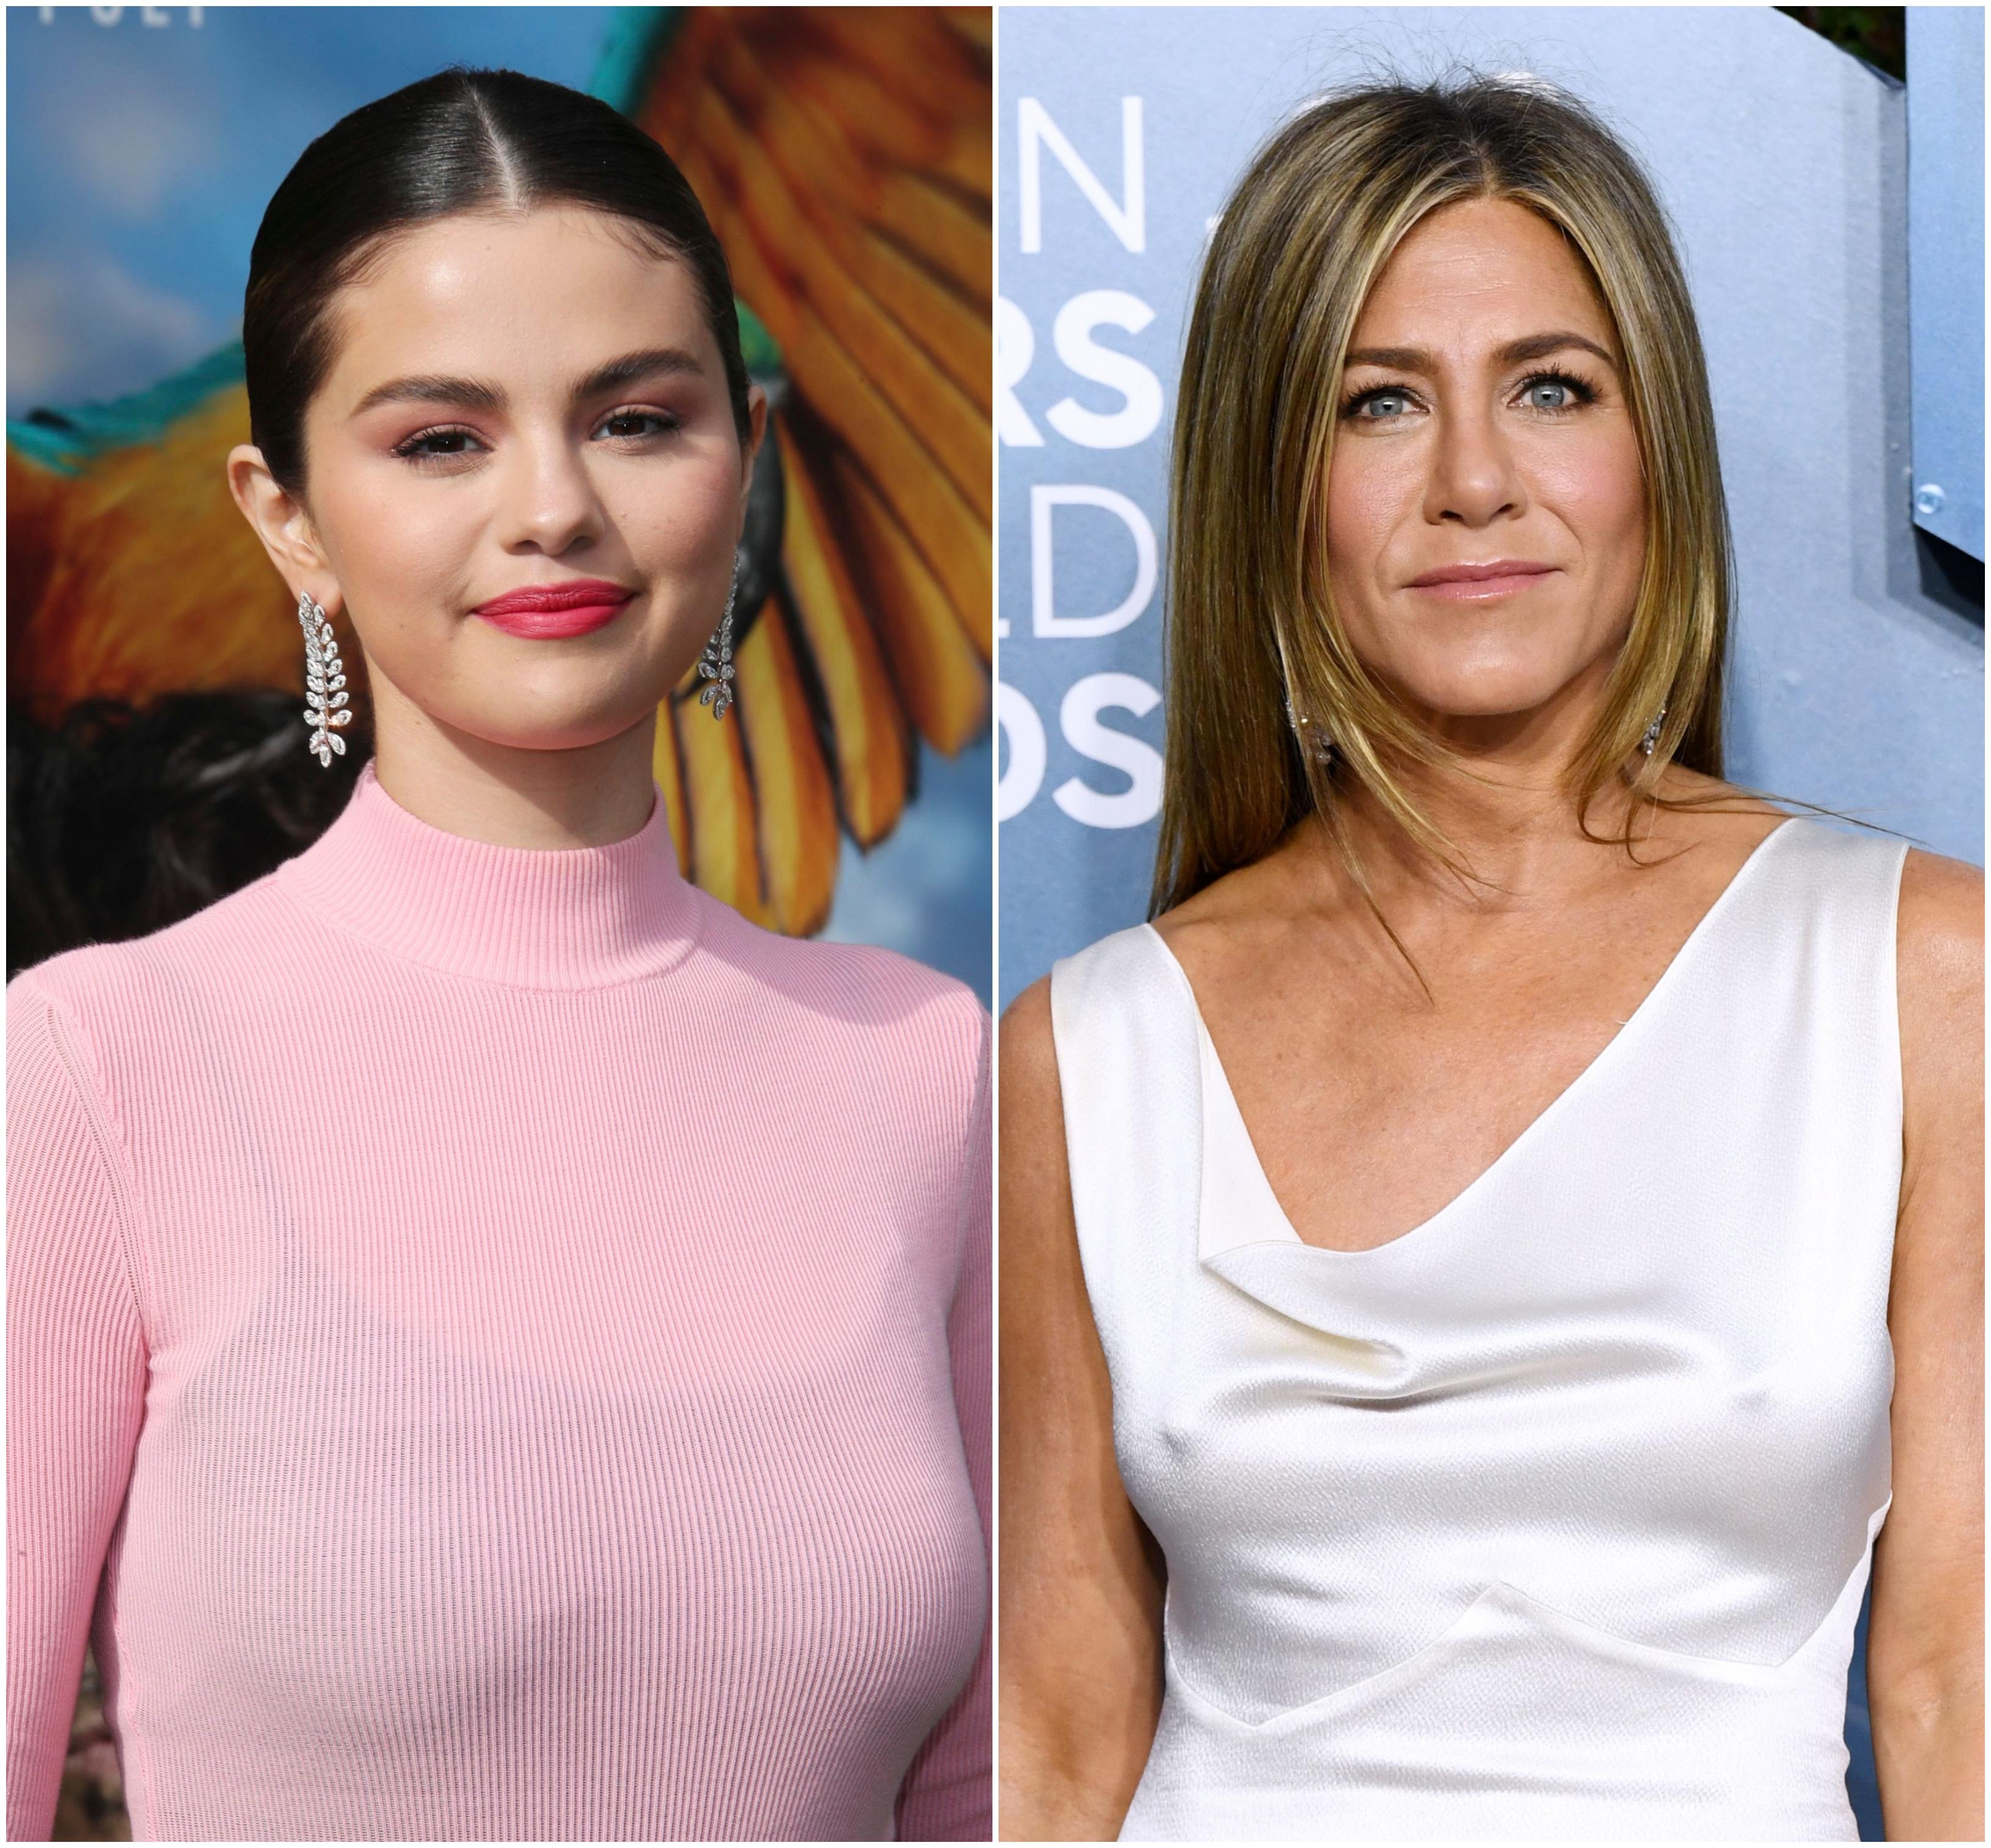 Selena Gomez Fangirls Over 'Queen' Jennifer Aniston After Interview on 'The Ellen DeGeneres Show'